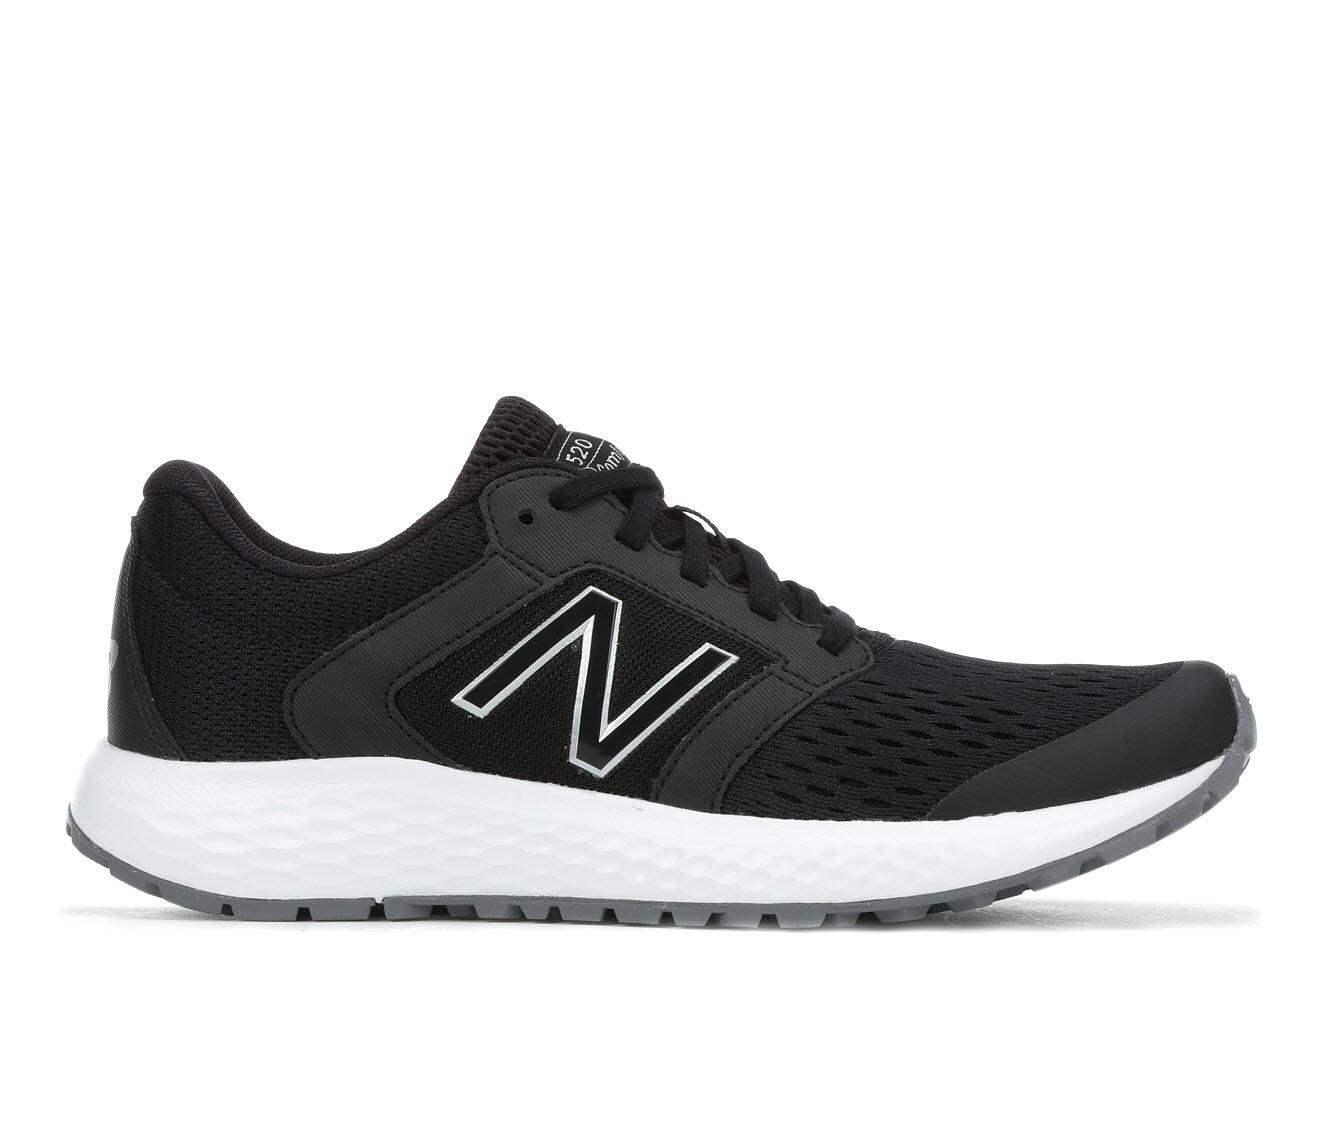 New Balance W520v5 Women's Athletic Shoe (Black)